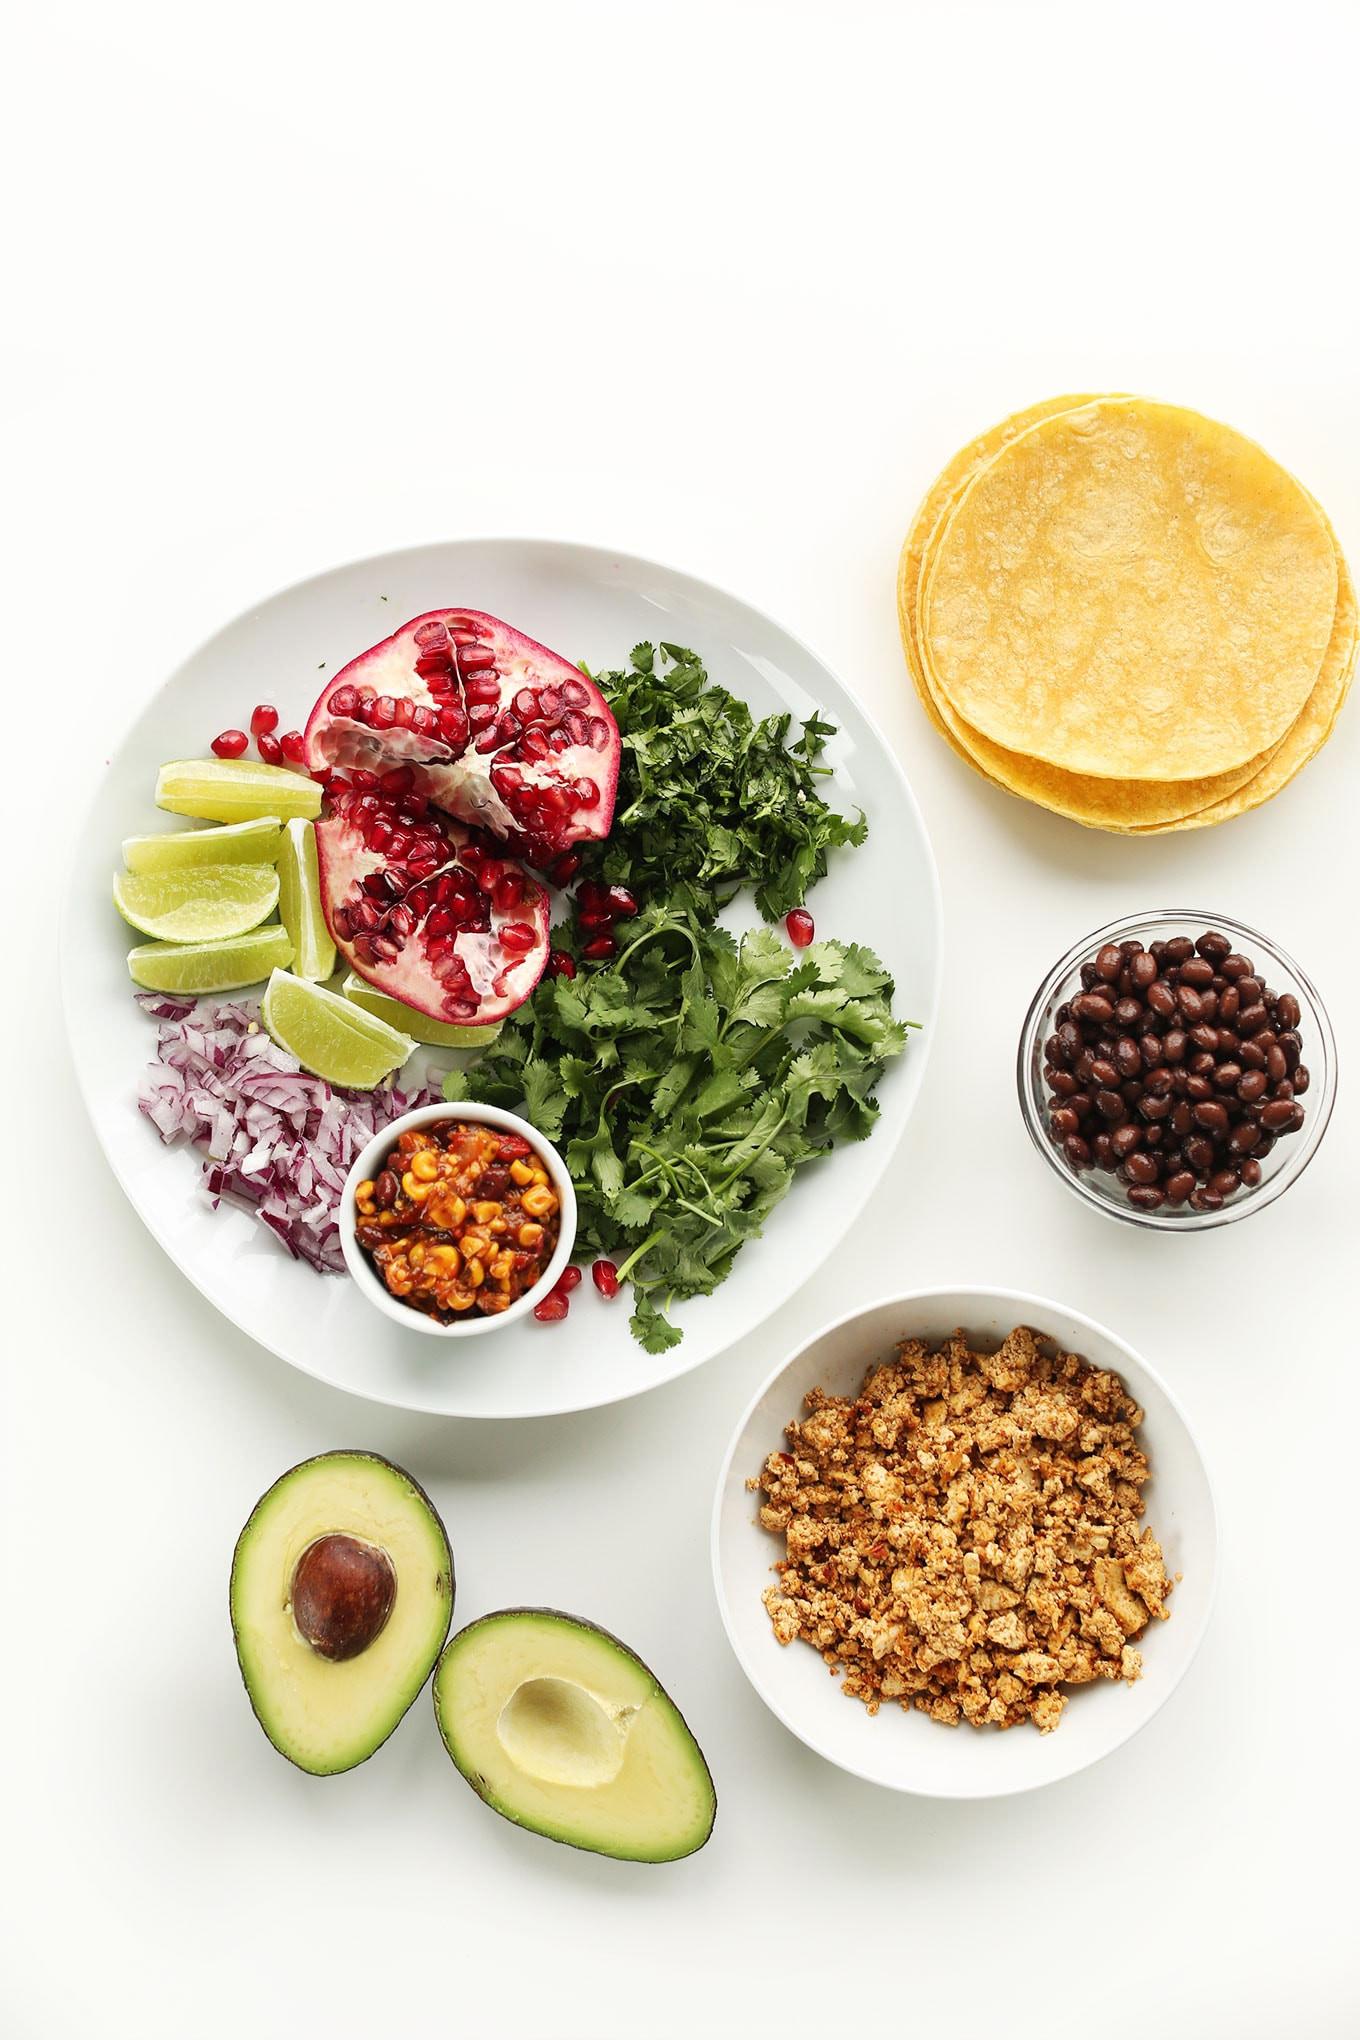 Easy Vegan Breakfast Healthy  Meal Prep Recipes Breakfast Fit Foo Finds